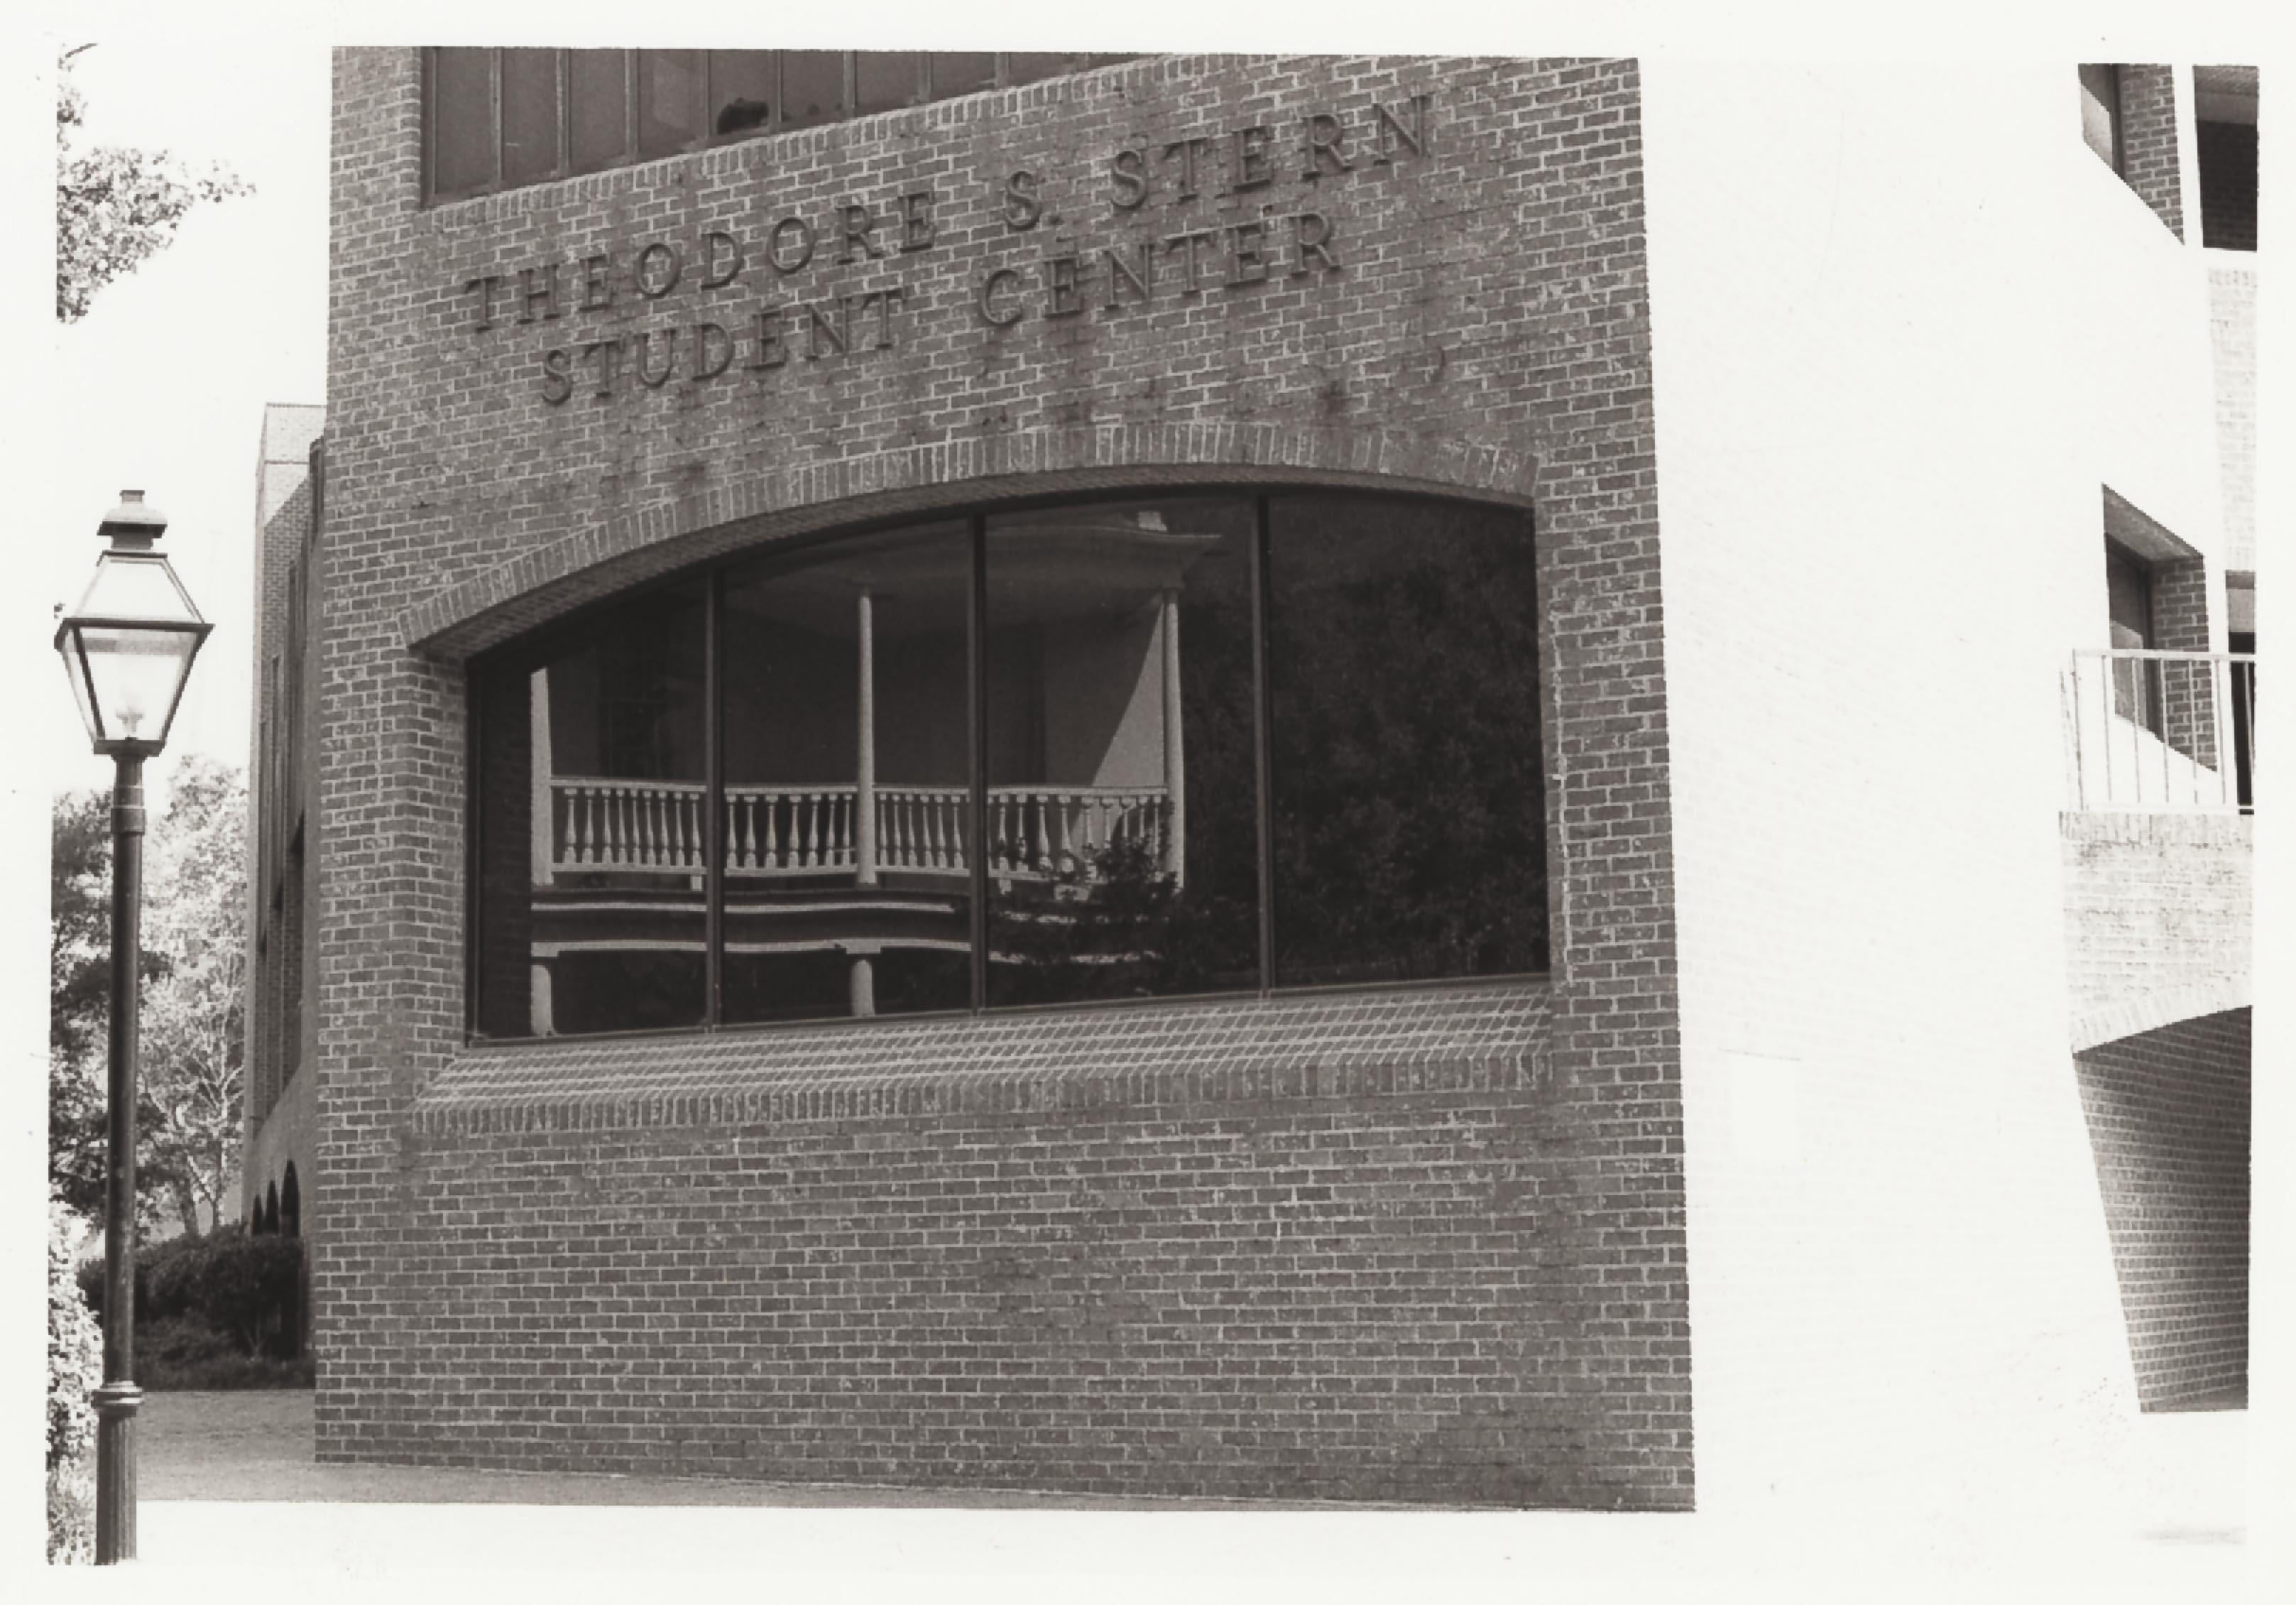 Stern Student Center